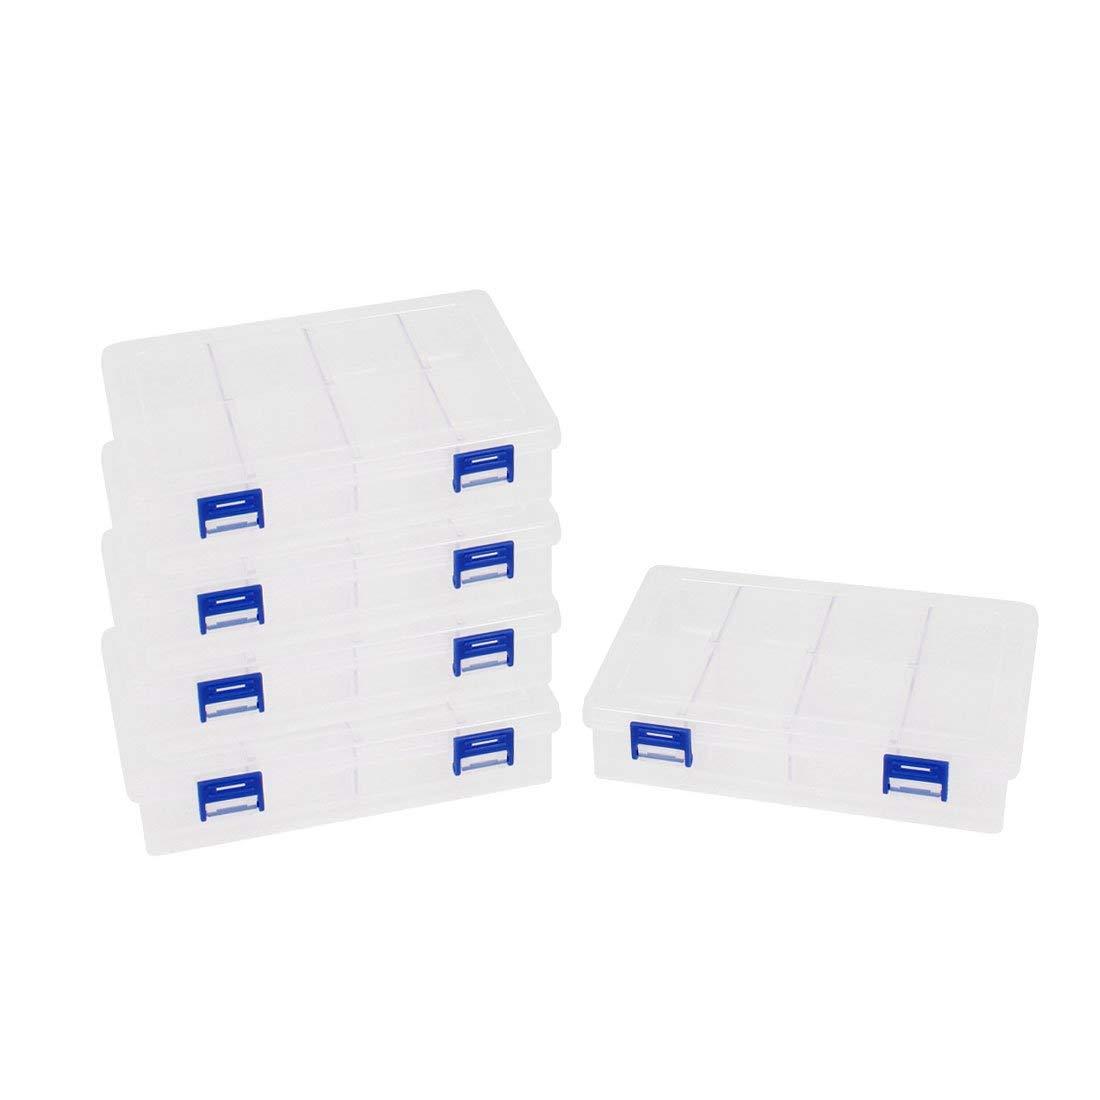 Aexit Plastic Detachable Tool Organizers 8 Grid Screws Electronic Parts Storage Box Tool Boxes 5 Pcs